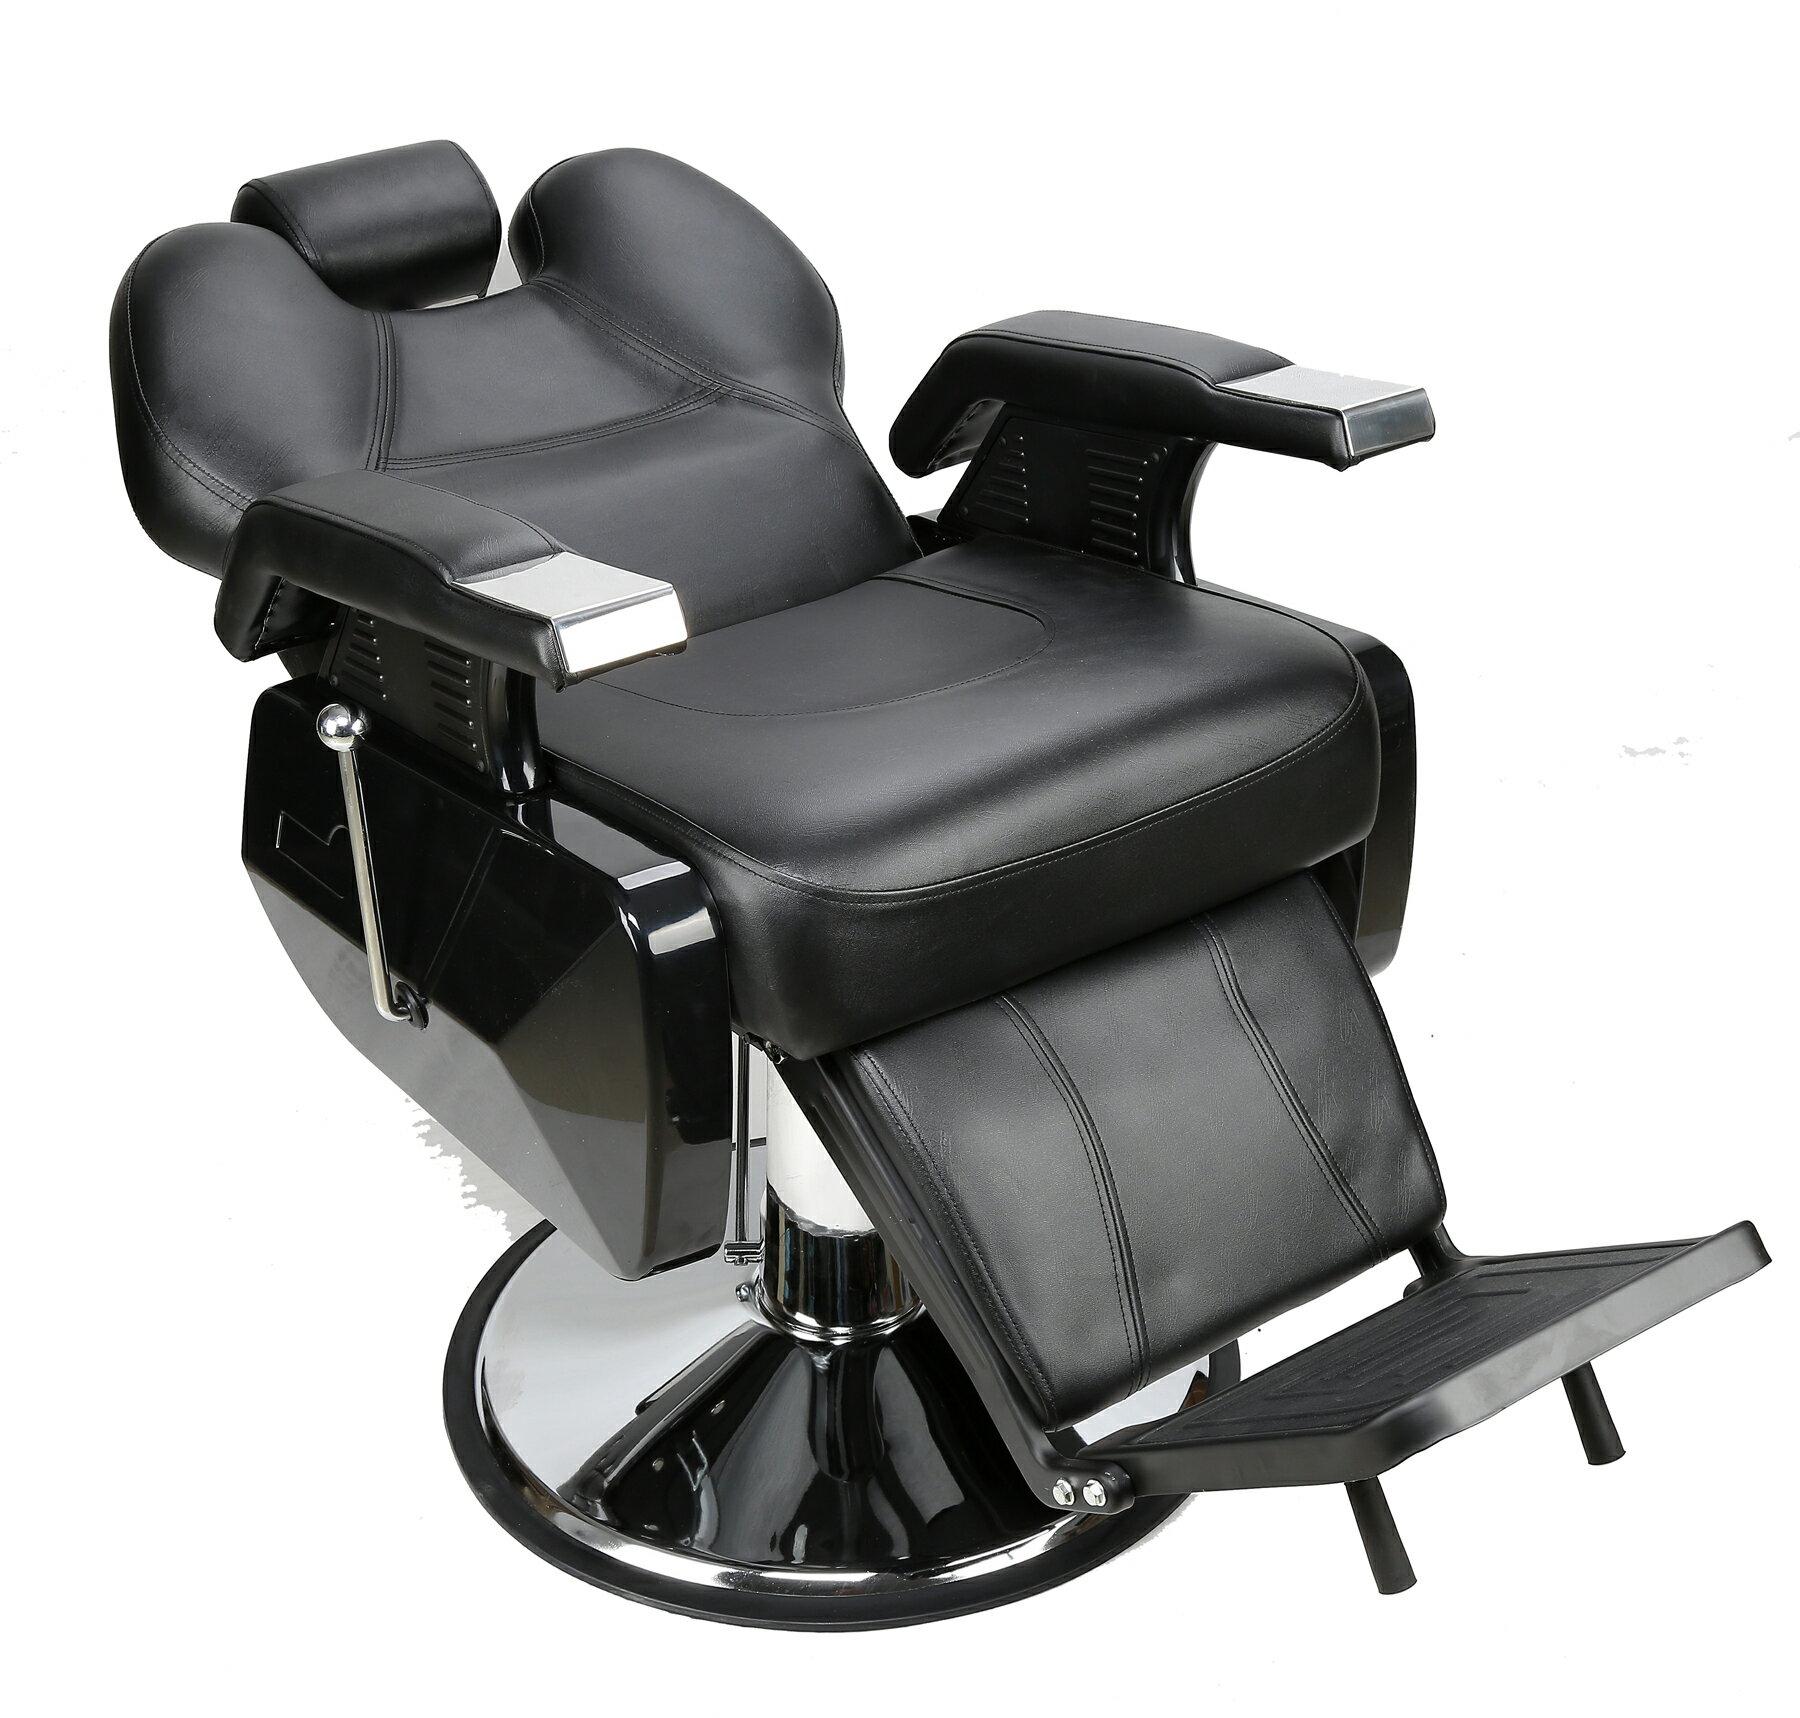 BarberPub All Purpose Hydraulic Recline Salon Beauty Spa Styling Barber  Chair Black